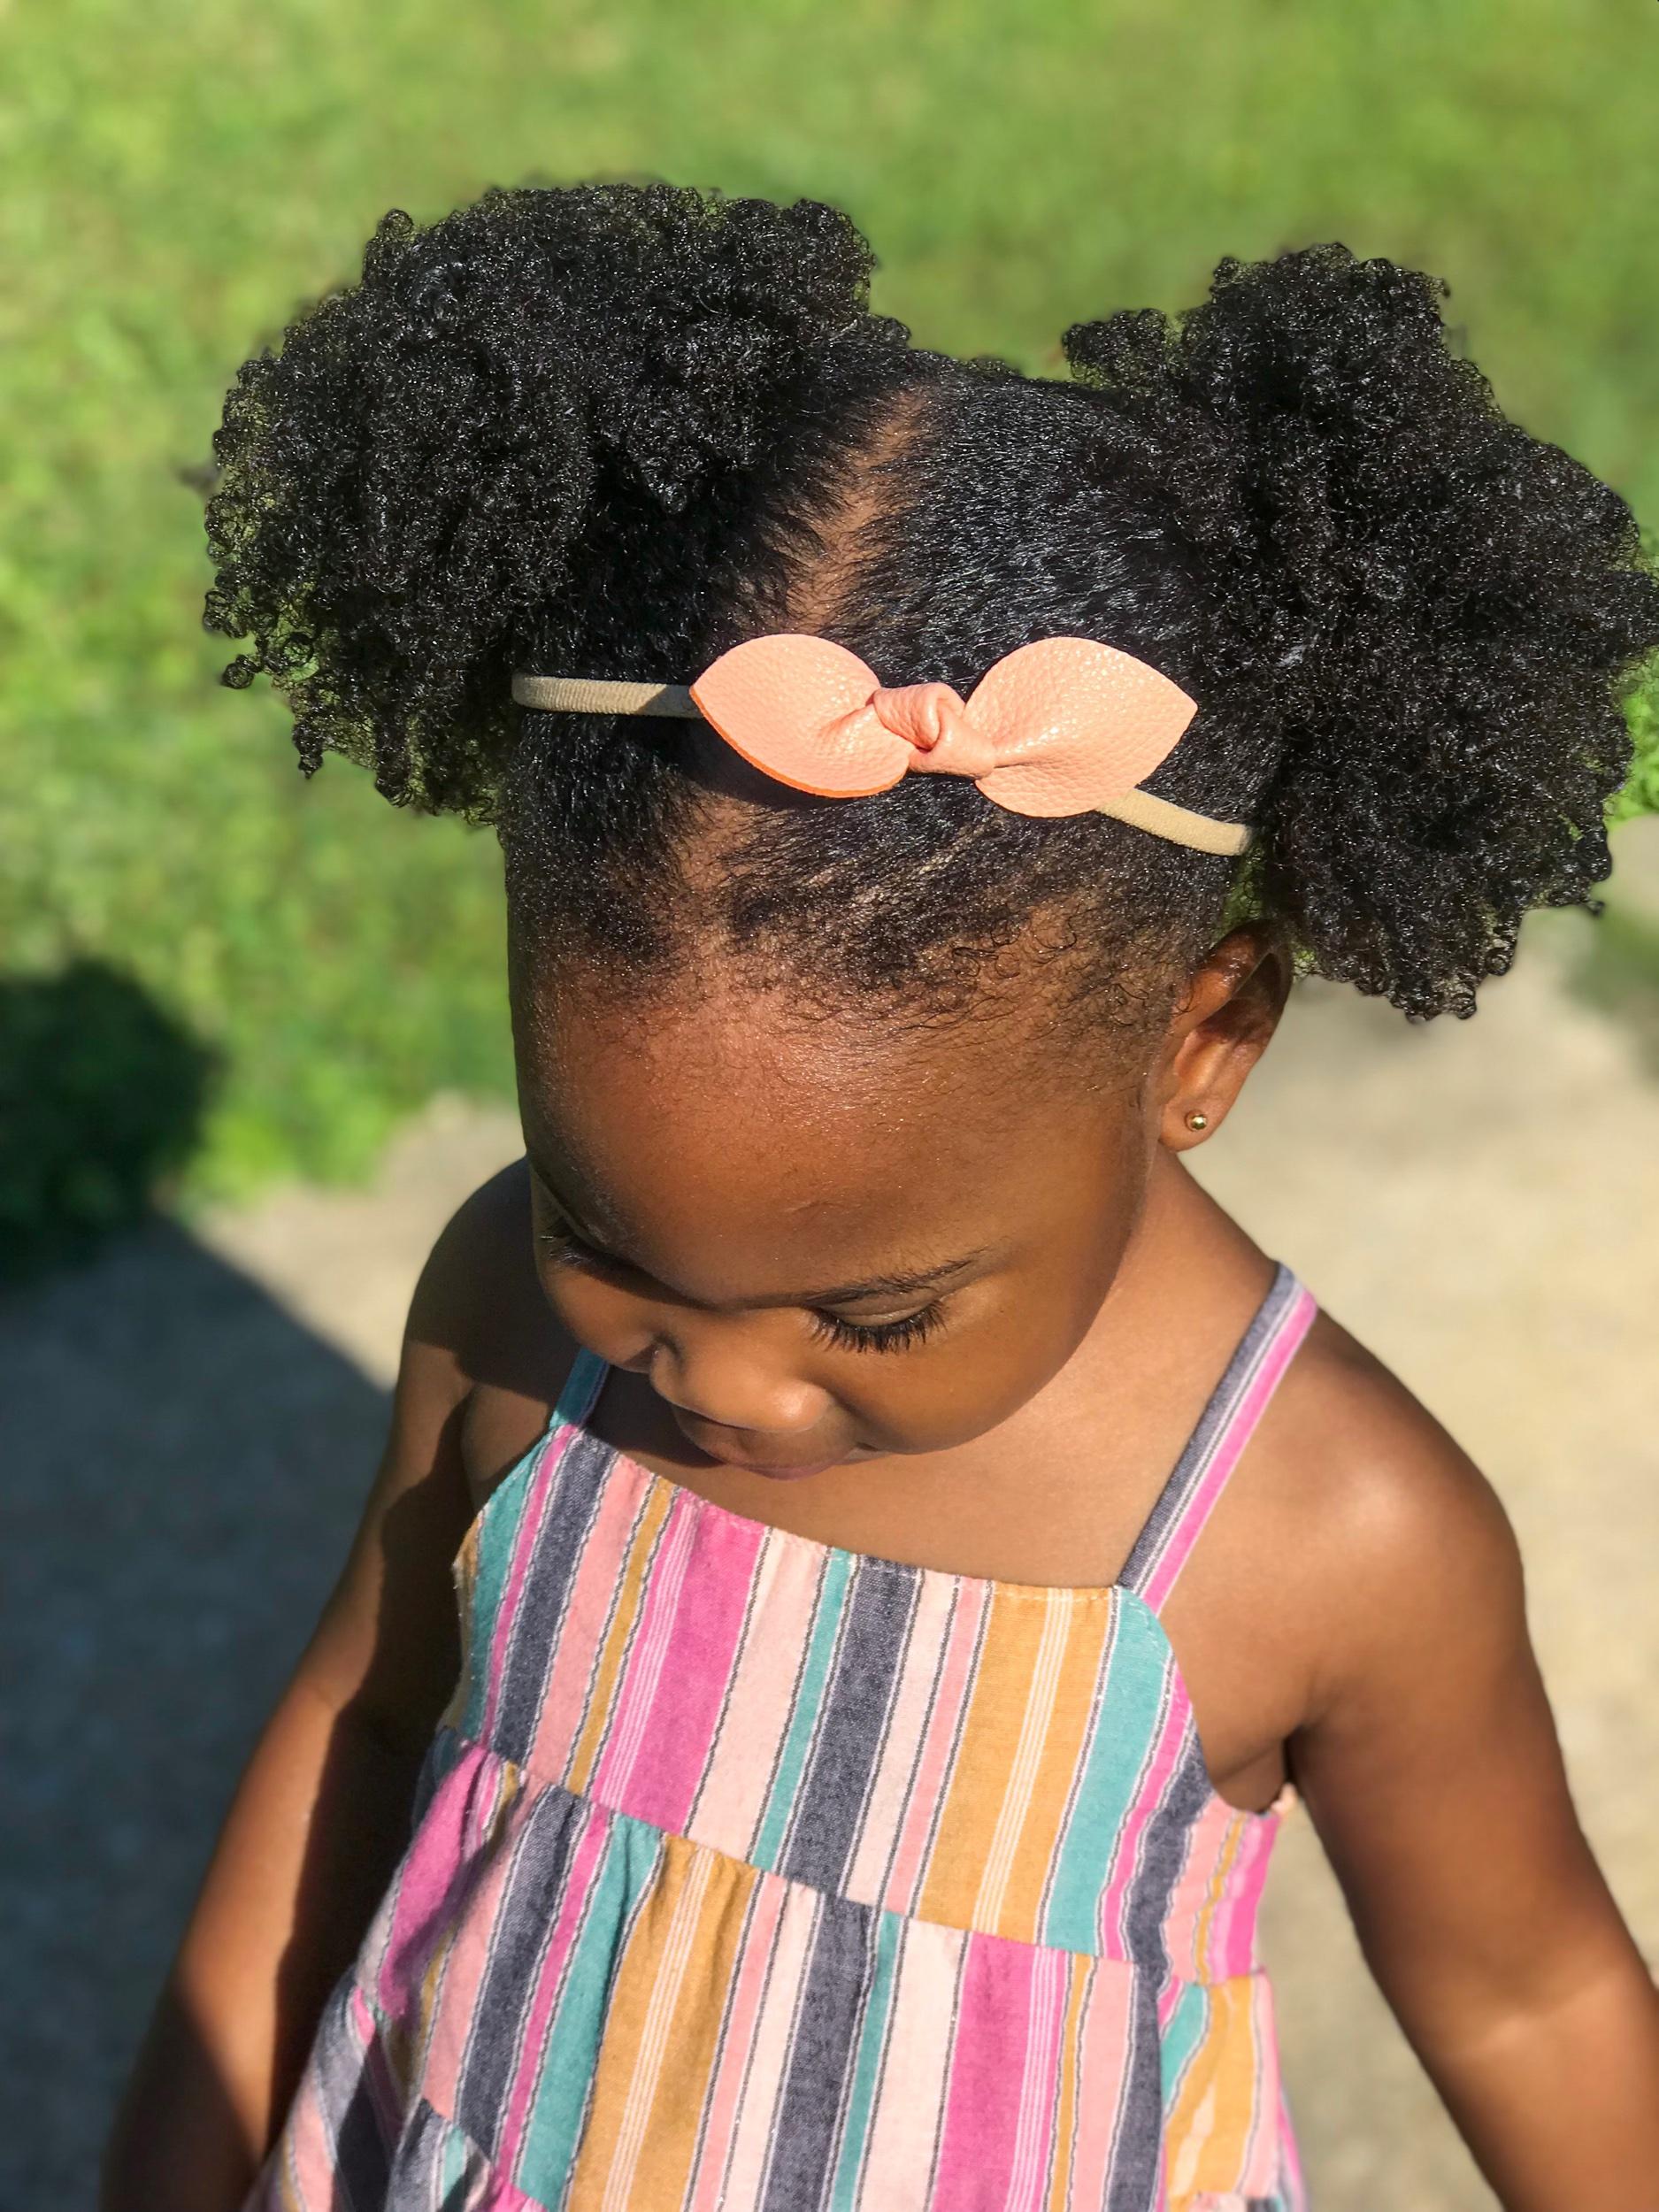 Toddler Curly Hair Routine | Pish Posh Perfect